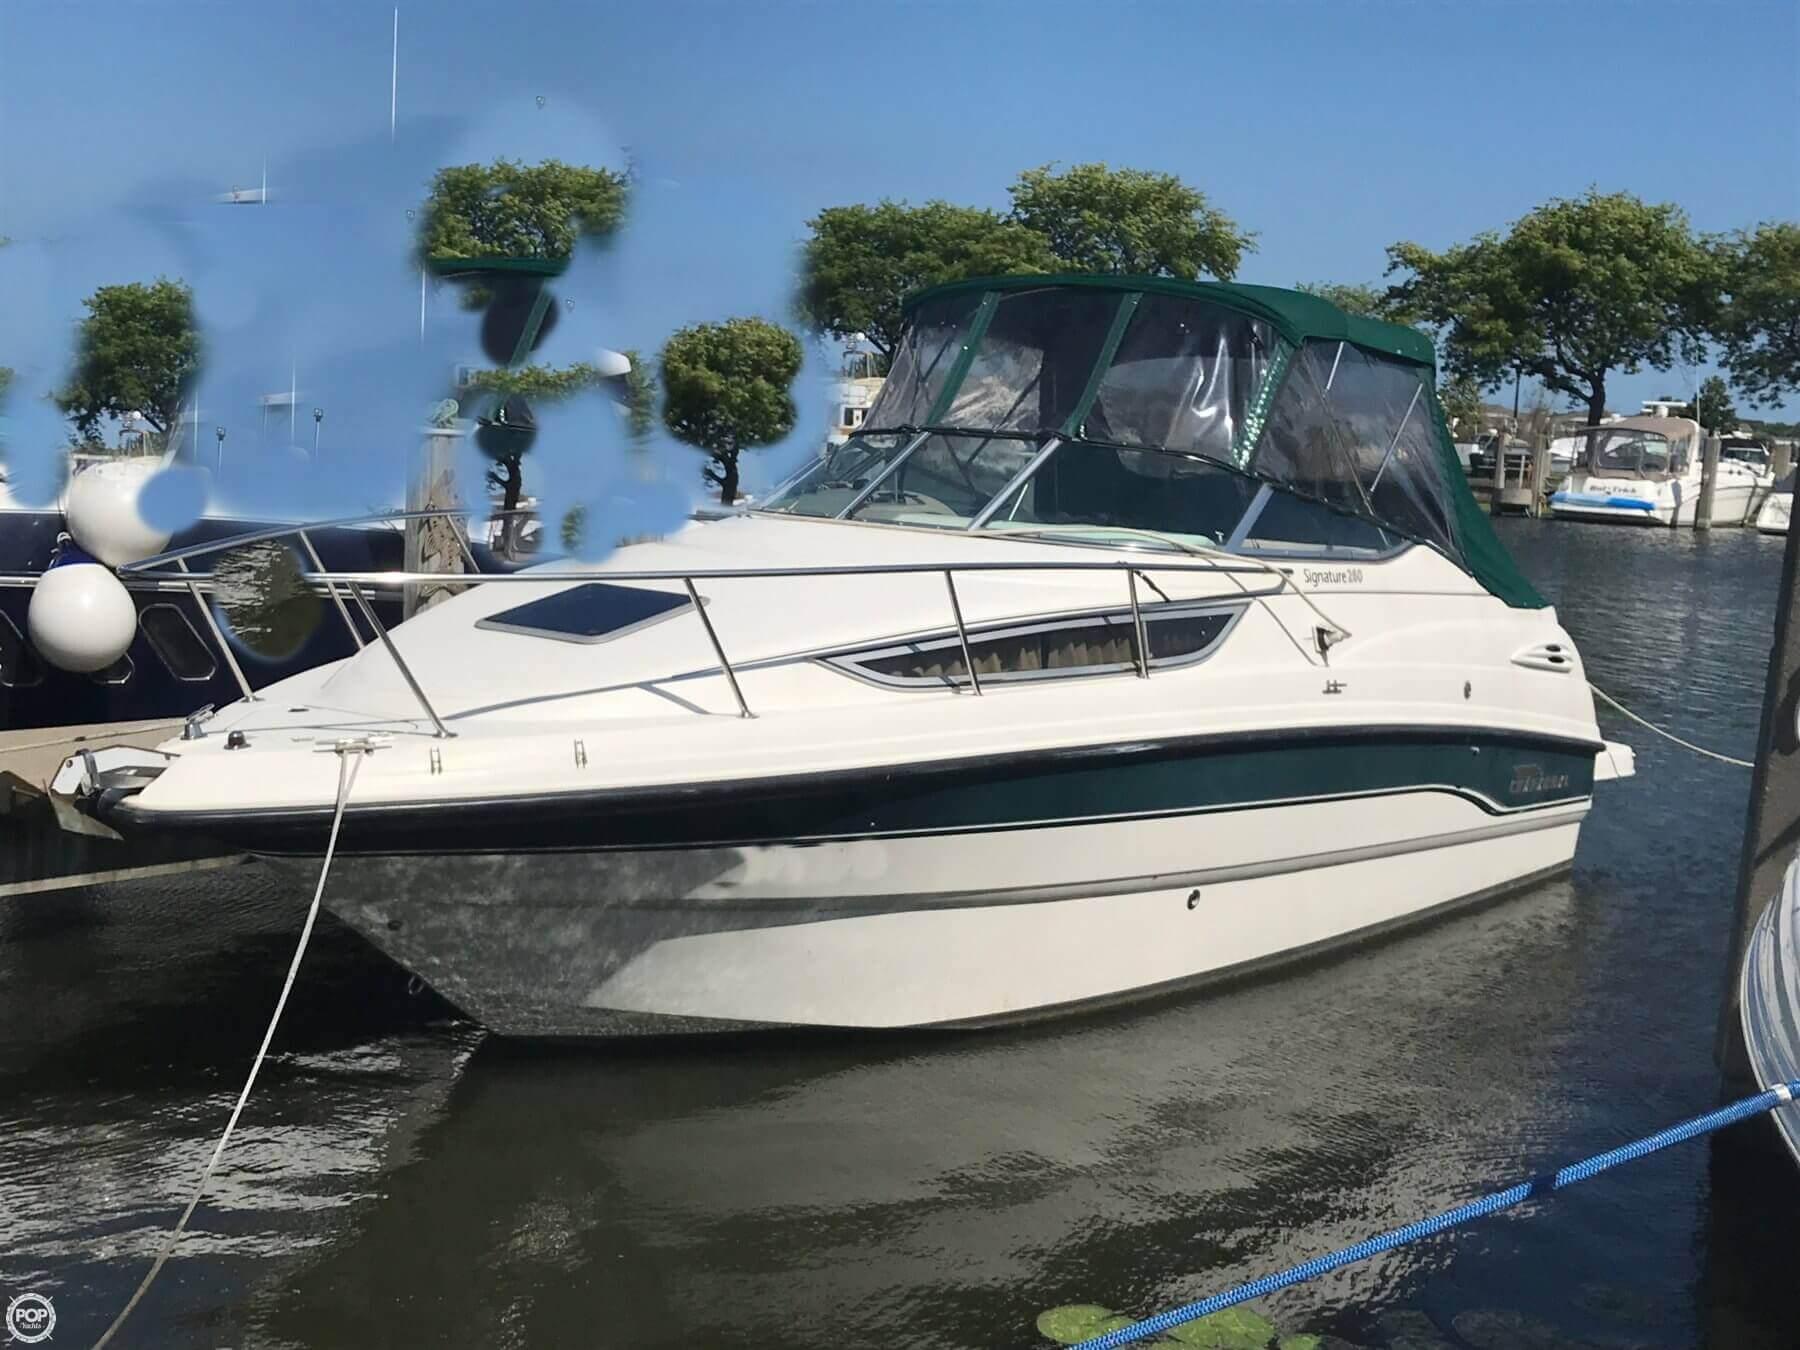 Chaparral Signature 260 Boat For Sale In Grand Haven MI 22000